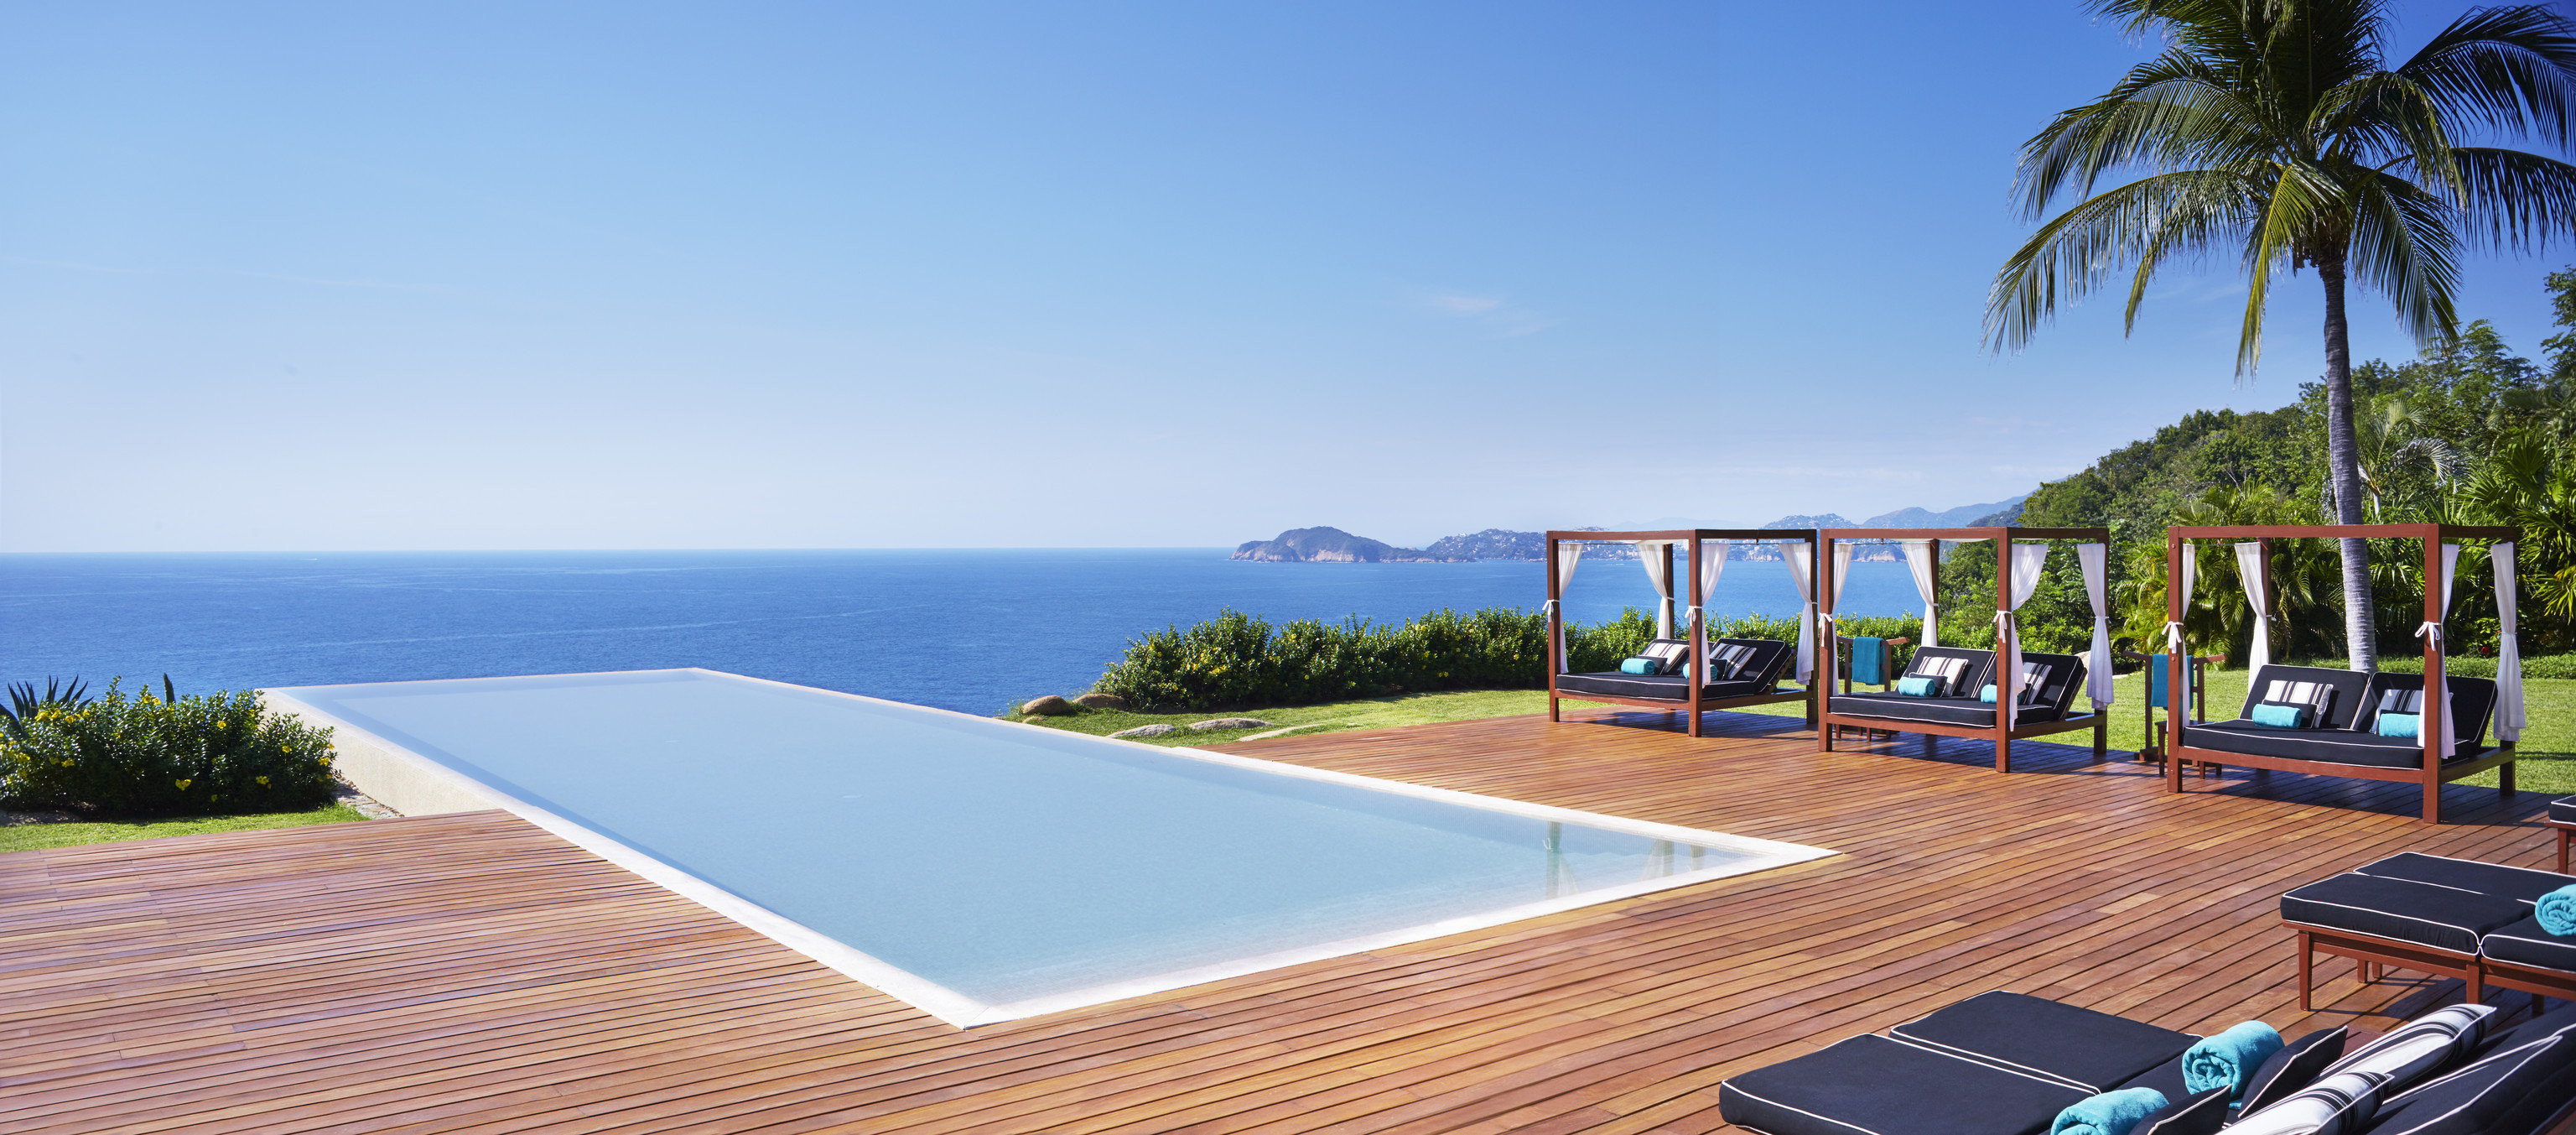 sky water property leisure swimming pool Deck Resort Villa condominium caribbean walkway Beach dock Sea overlooking shore